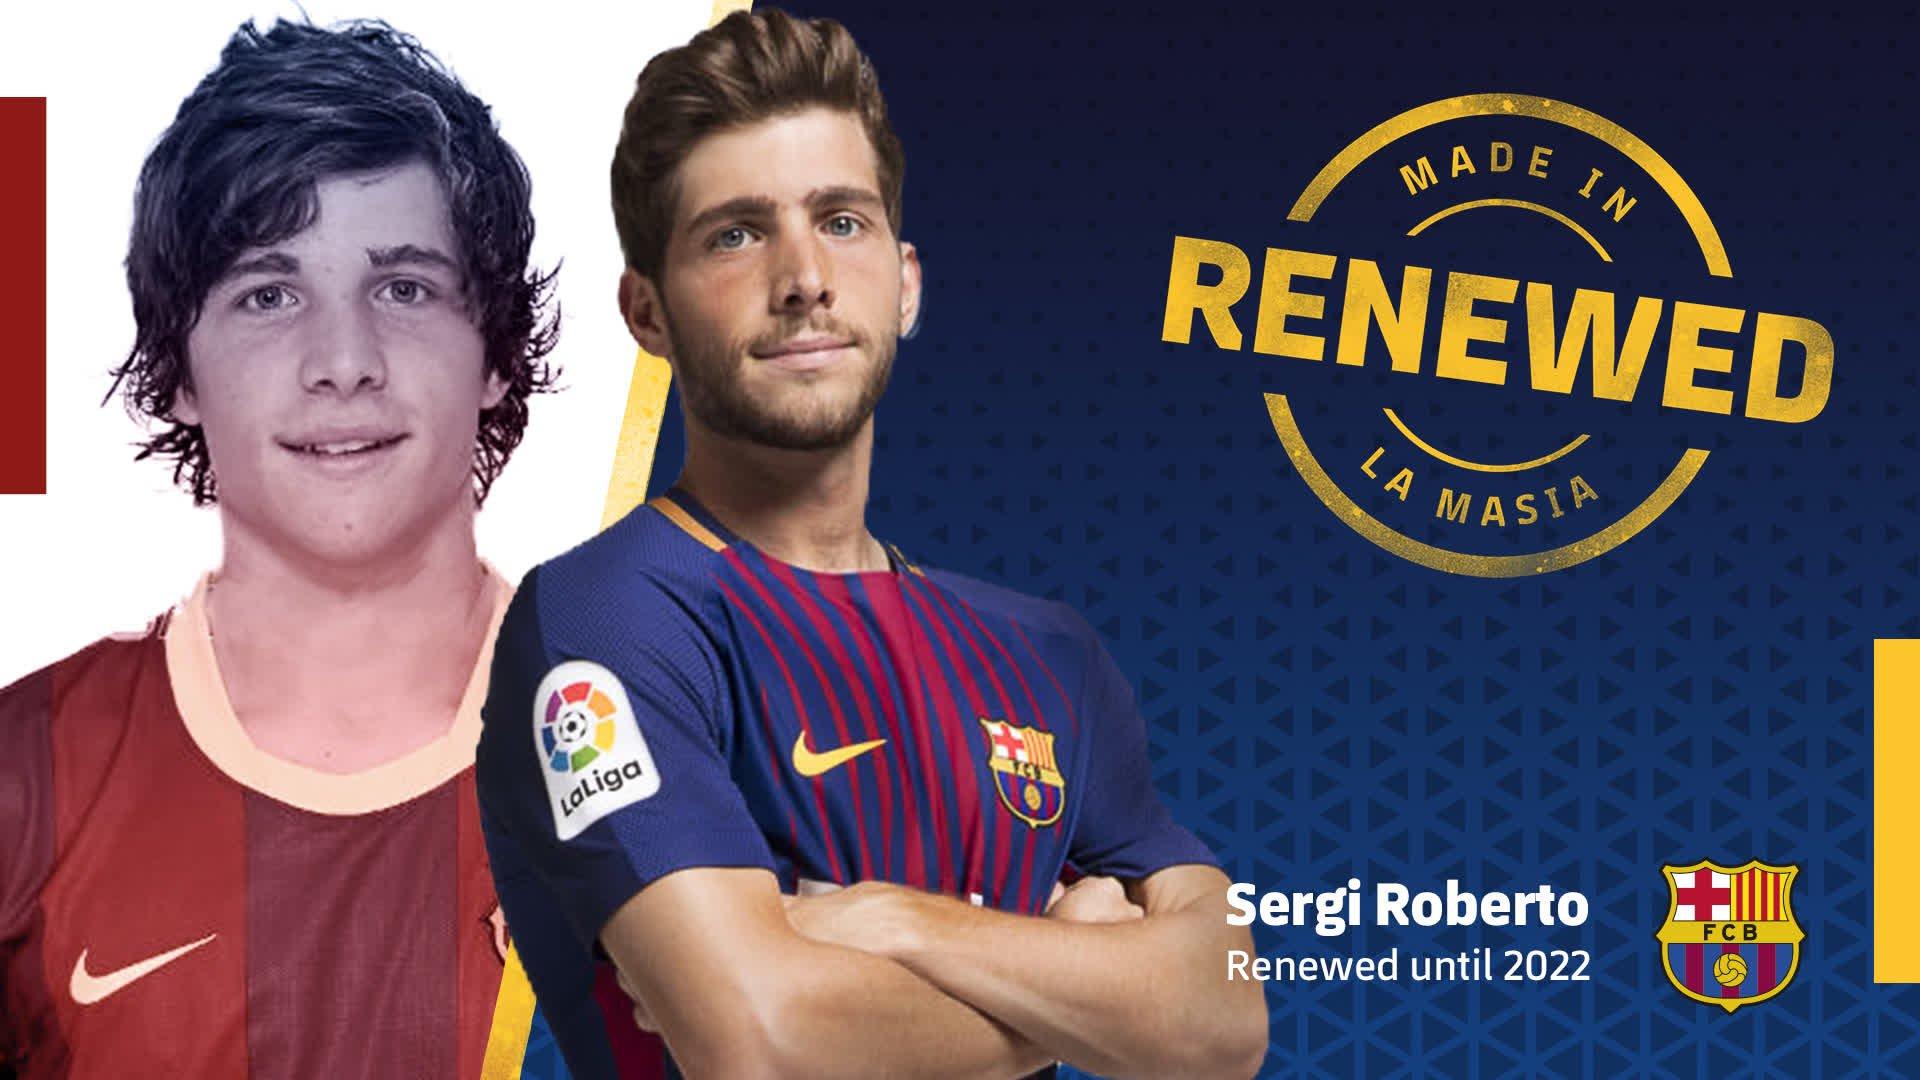 ���� #SergiRoberto2022 The dream never dies... https://t.co/CX25x5xwWy